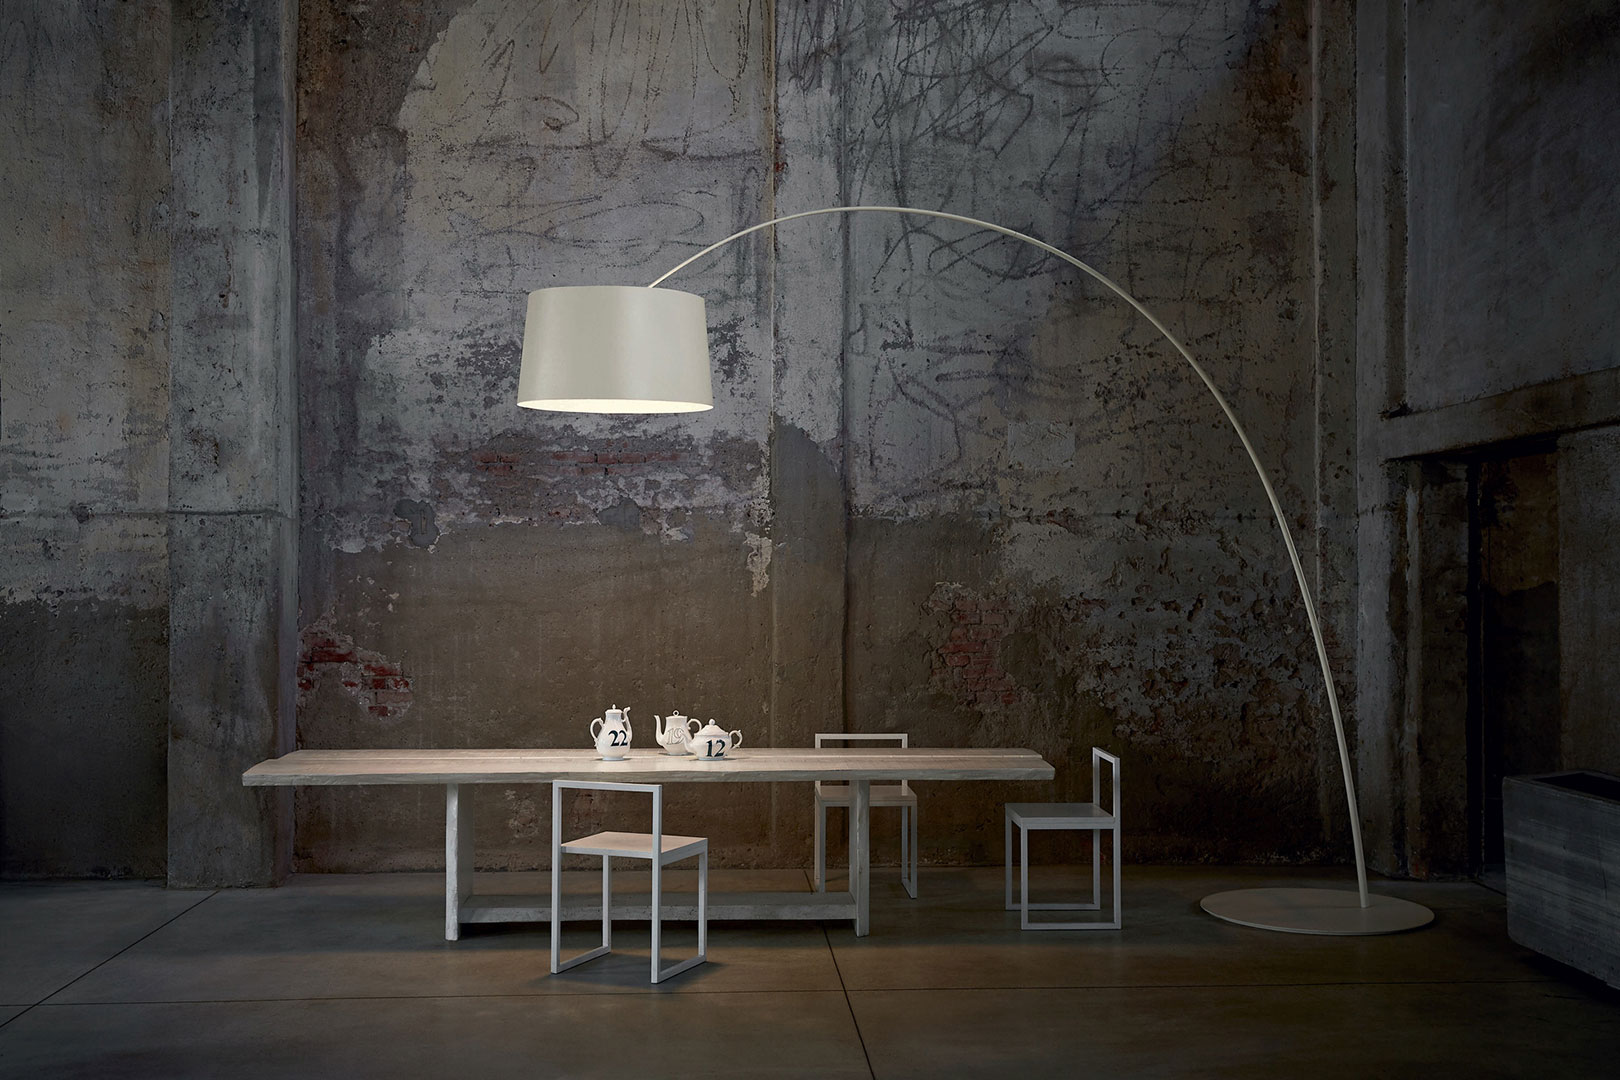 Lampada Da Terra Twiggy Foscarini.Twiggy Floor Lamps In Living Room The Best Solution